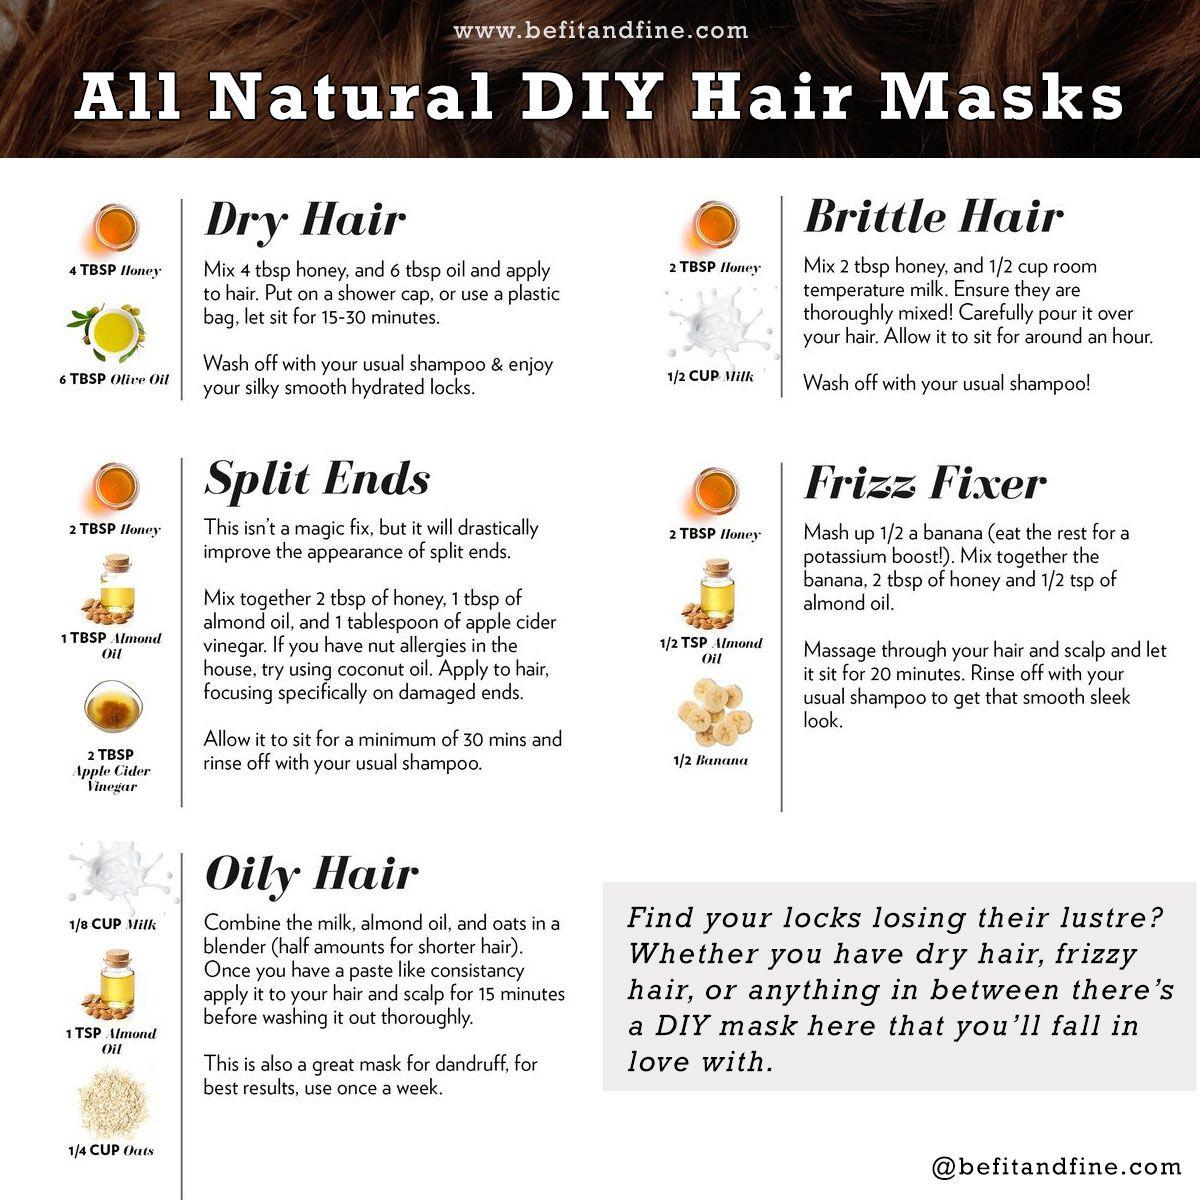 All Natural DIY Hair Masks Dry Hair Split End Oily Hair